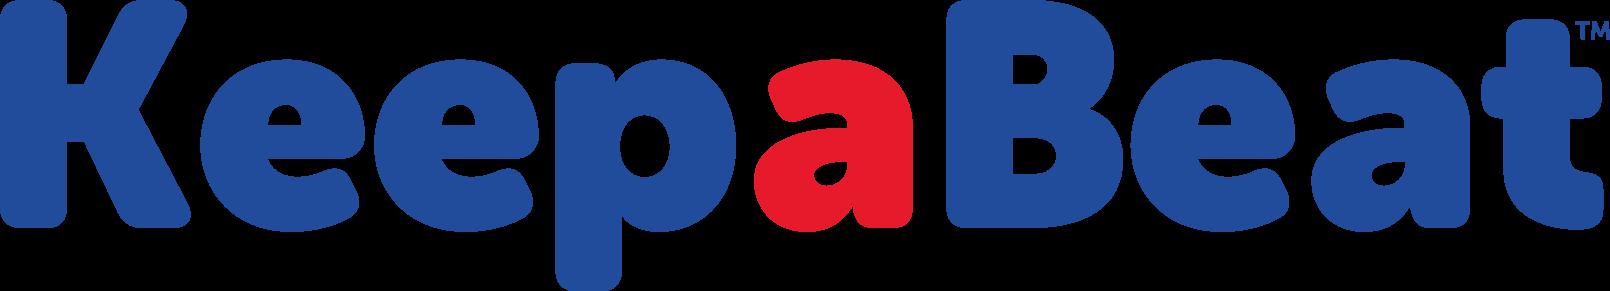 KeepaBeat First Aid Shop